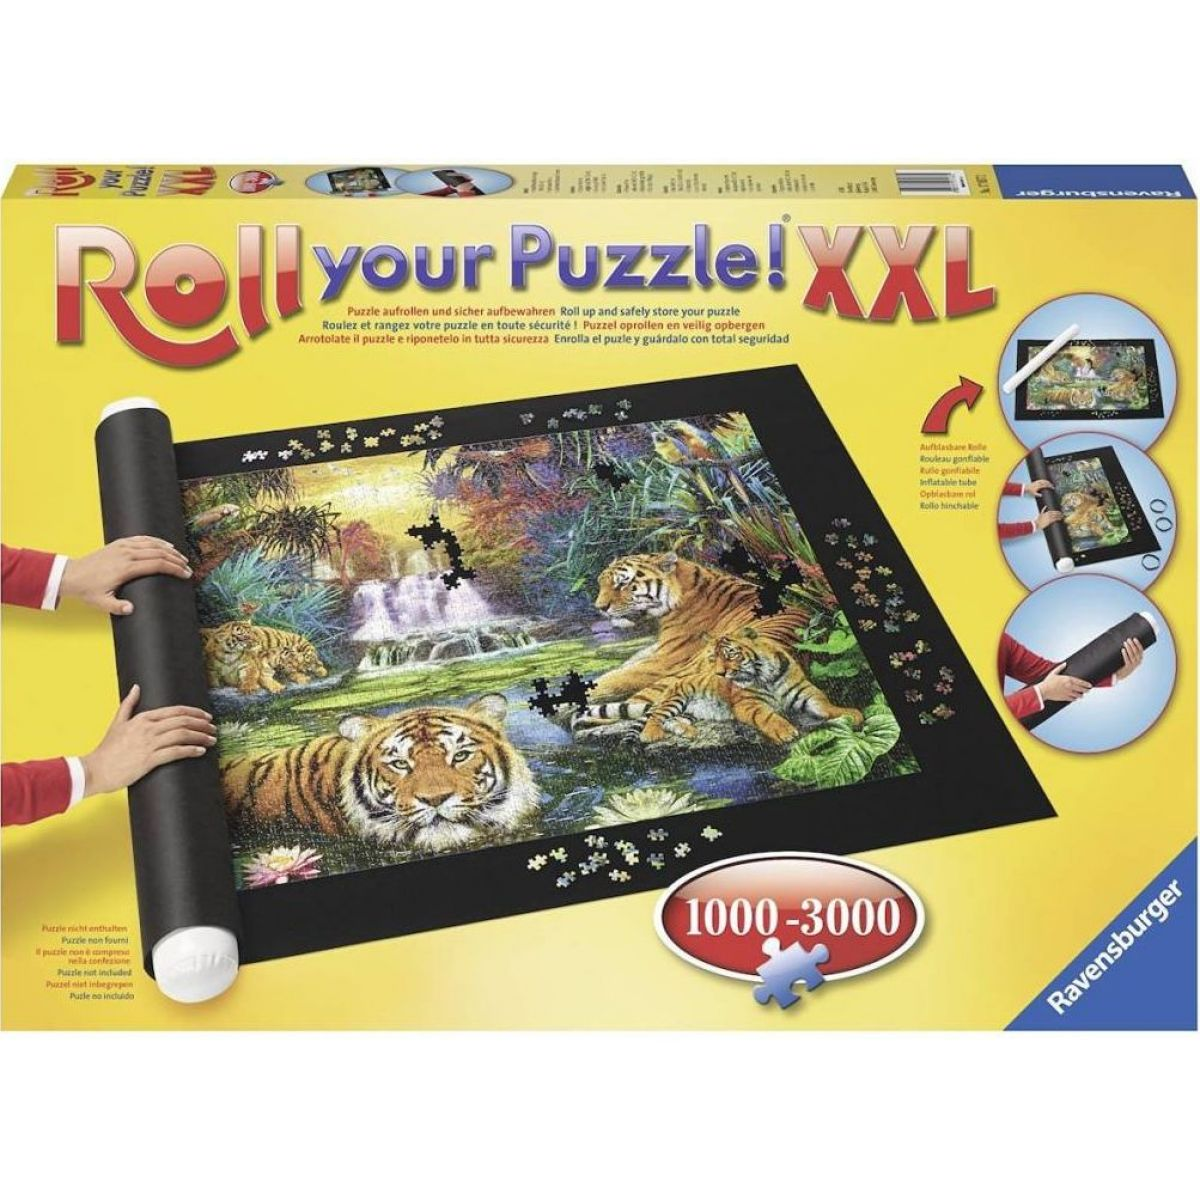 Ravensburger Roll Your Puzzle Podložka XXL 1000 - 3000 dielikov